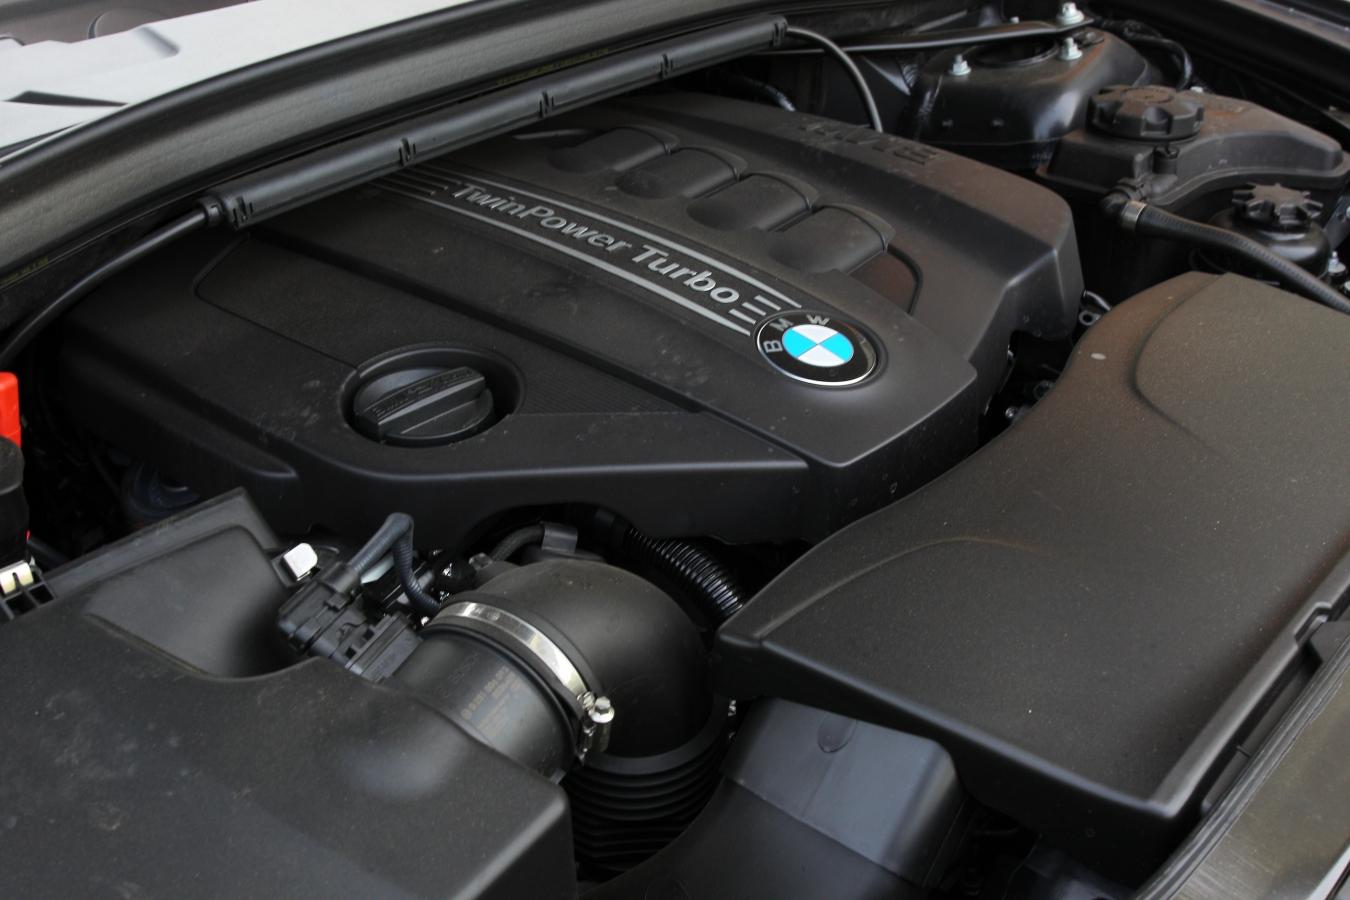 BMW X1 xDrive25d motor